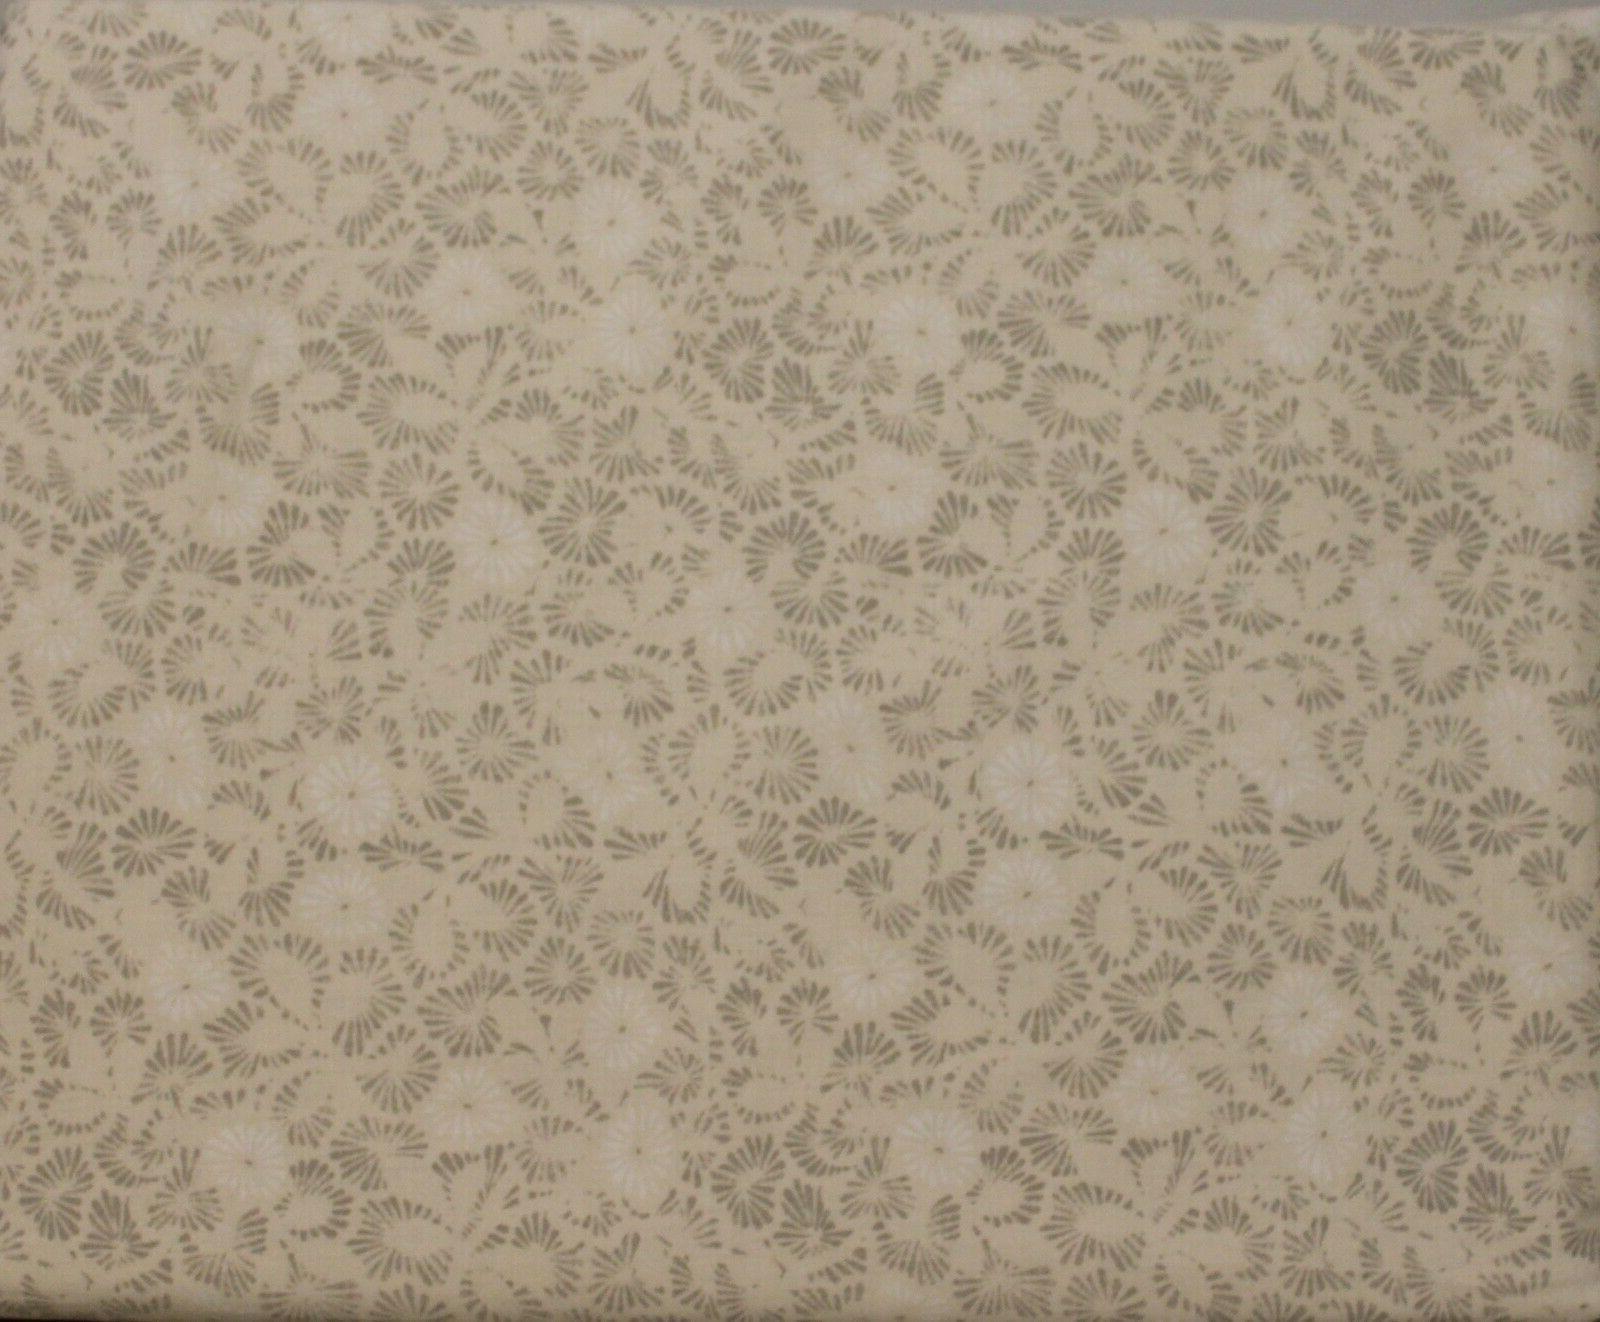 Ralph Lauren King Sheet Set 4pc Cottage Modern Floral